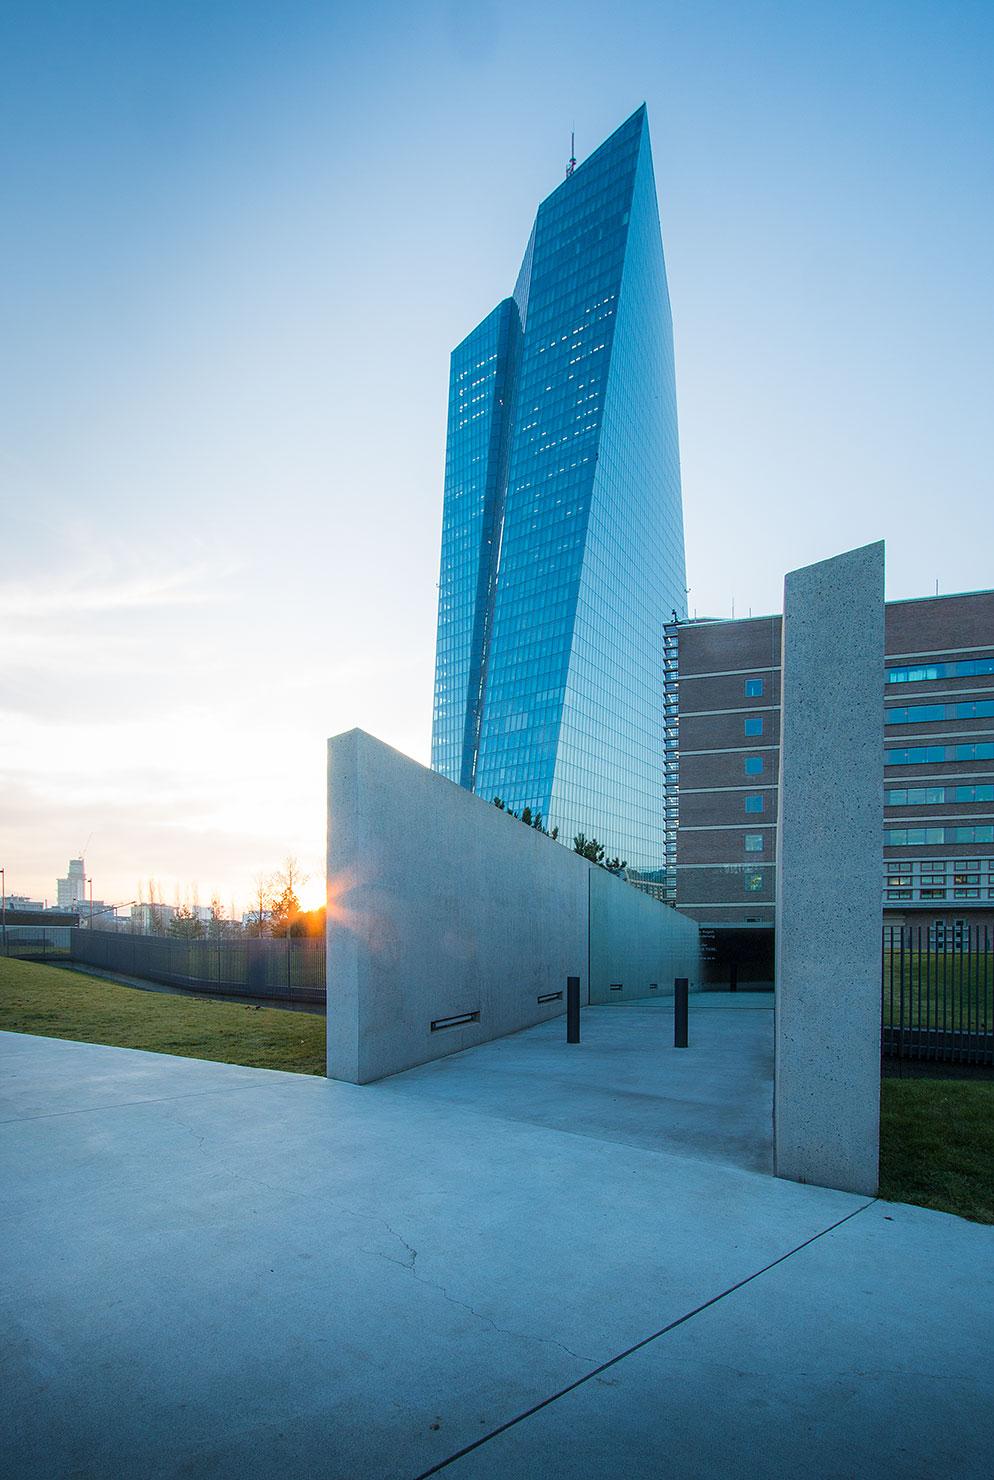 EZB Frankfurt